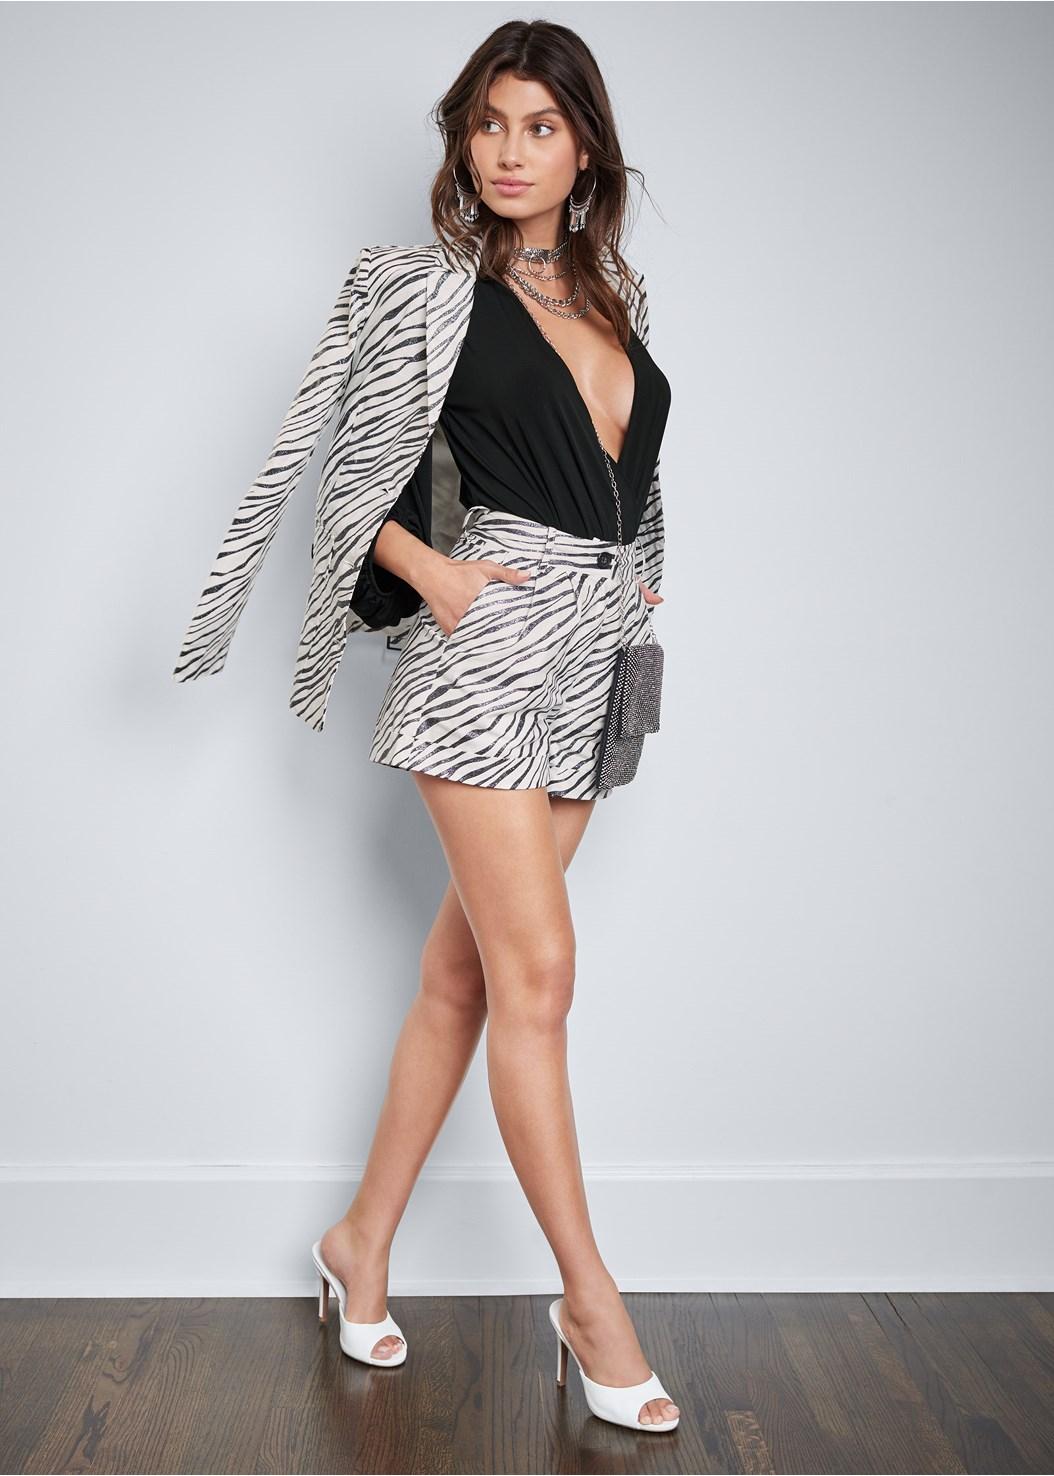 Zebra Print Shorts,Belted Zebra Print Blazer,Peep Toe Mules,Tassel Hoop Earrings,Chain Ring Choker Necklace,Chunky Chain Layer Necklace,Rhinestone Mini Crossbody